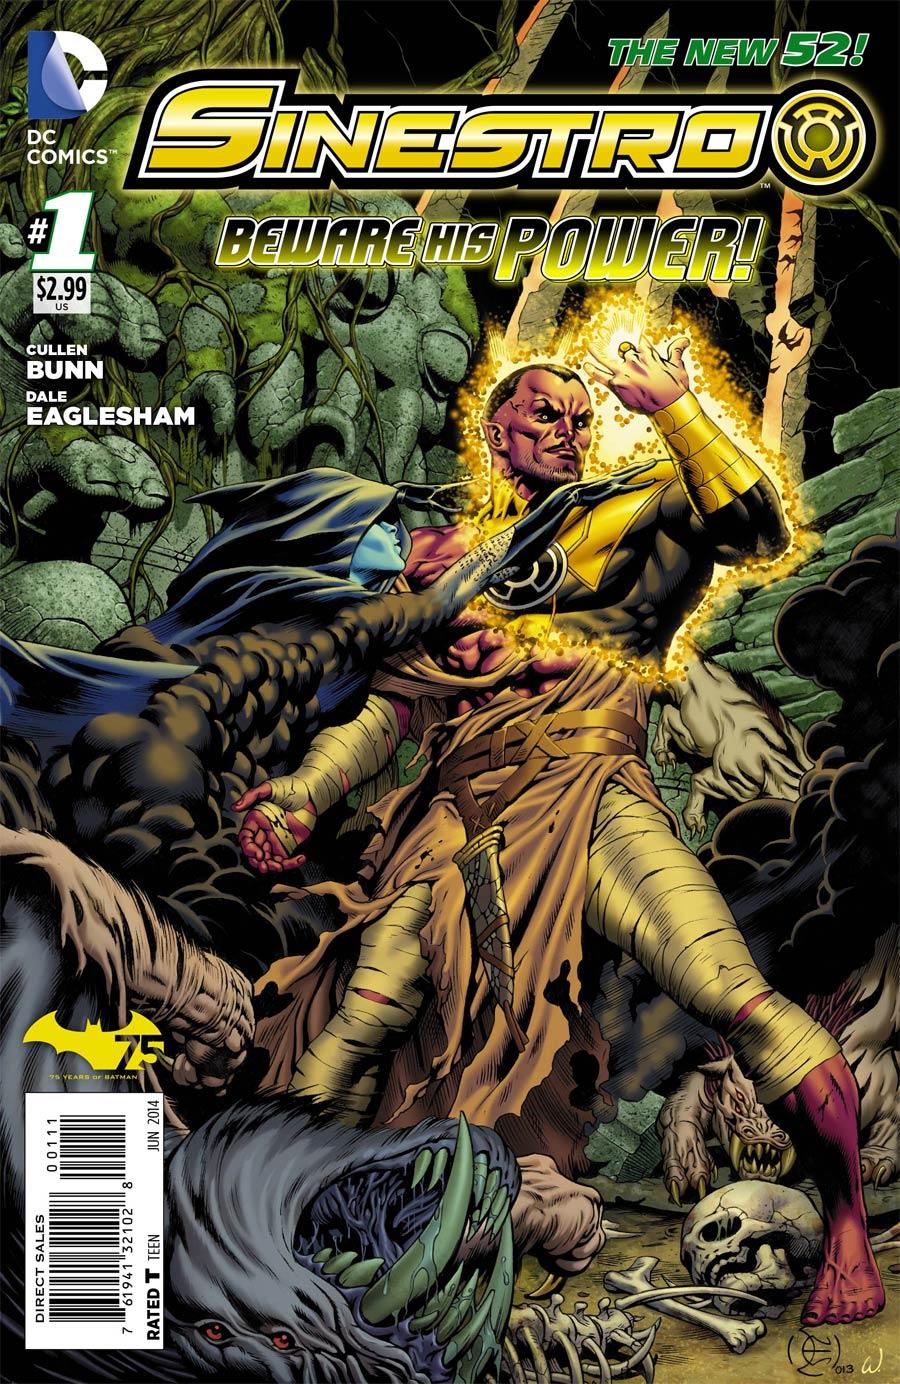 Sinestro #1 Cover A Regular Dale Eaglesham Cover